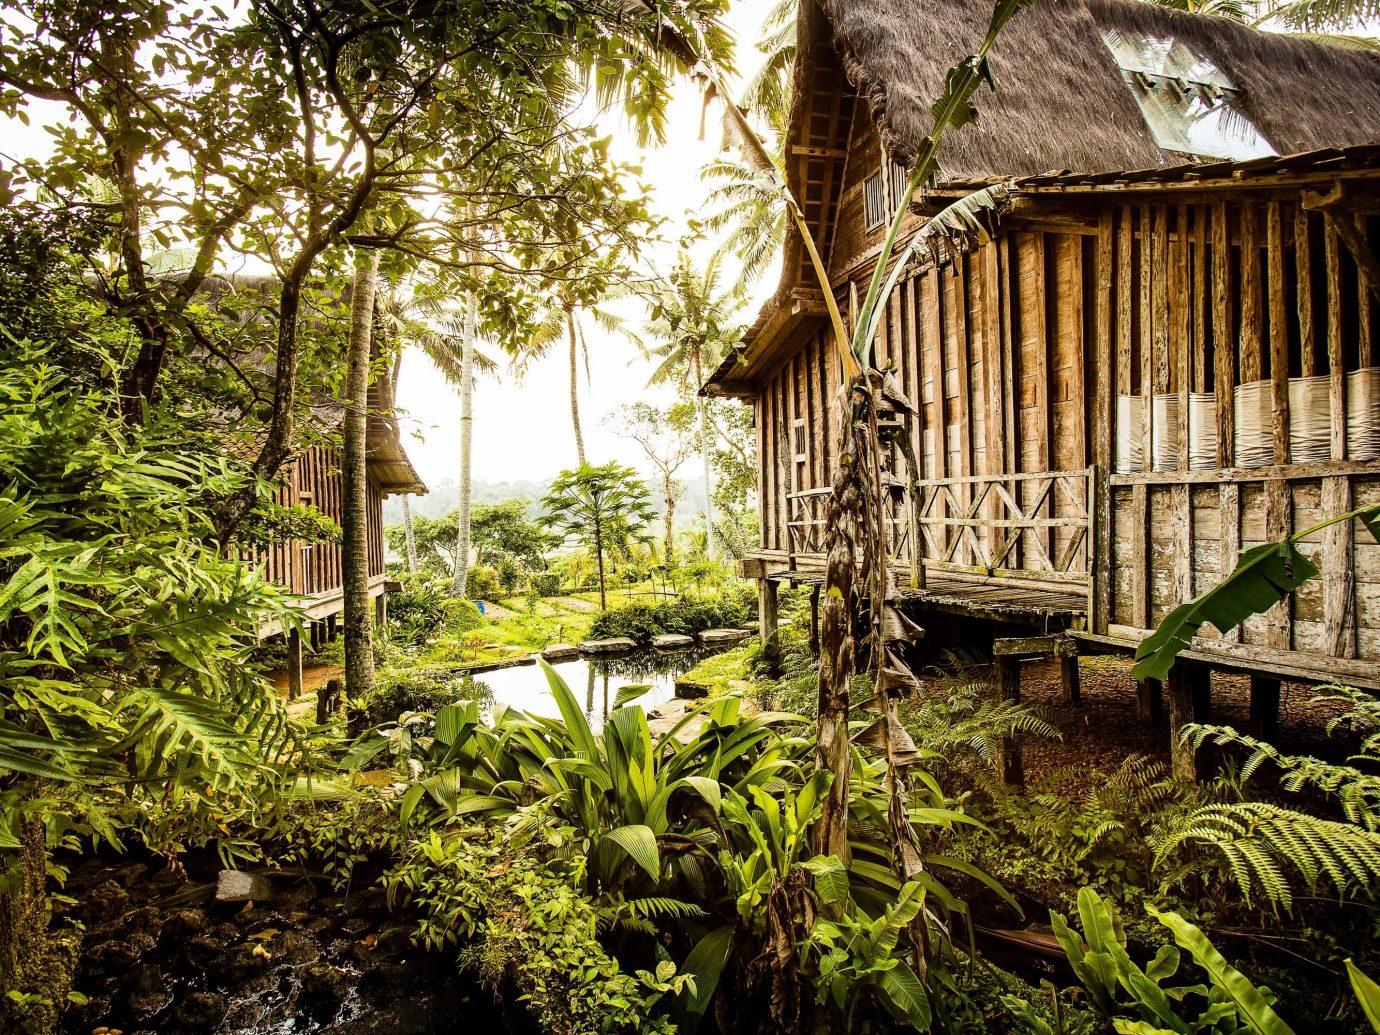 Boutique Hotels Hotels Nature vegetation plant tree Jungle leaf house rainforest Forest old growth forest arecales grass water landscape cottage outdoor structure woodland plantation